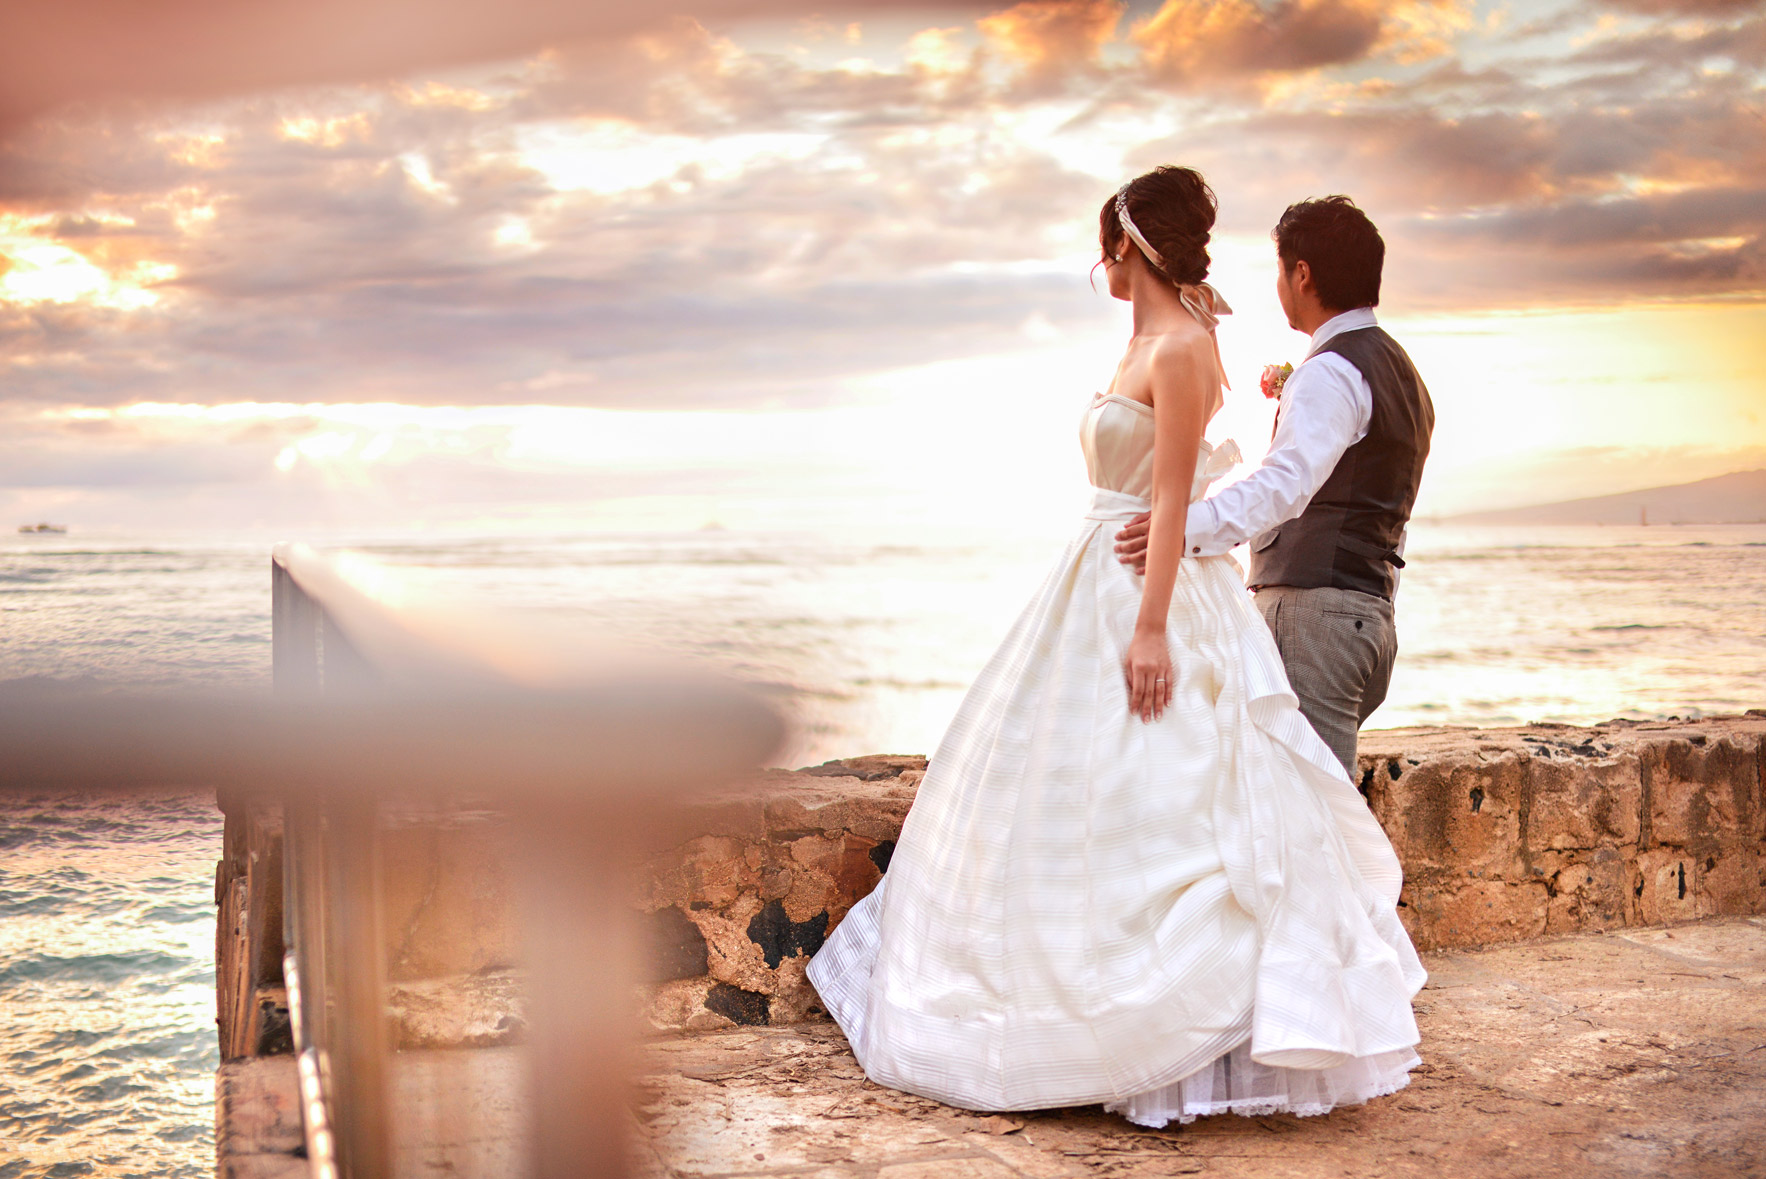 waikiki-beach-wedding-and-downtown-honolulu-hawaii-theater-stephen-ludwig-photography158.jpg